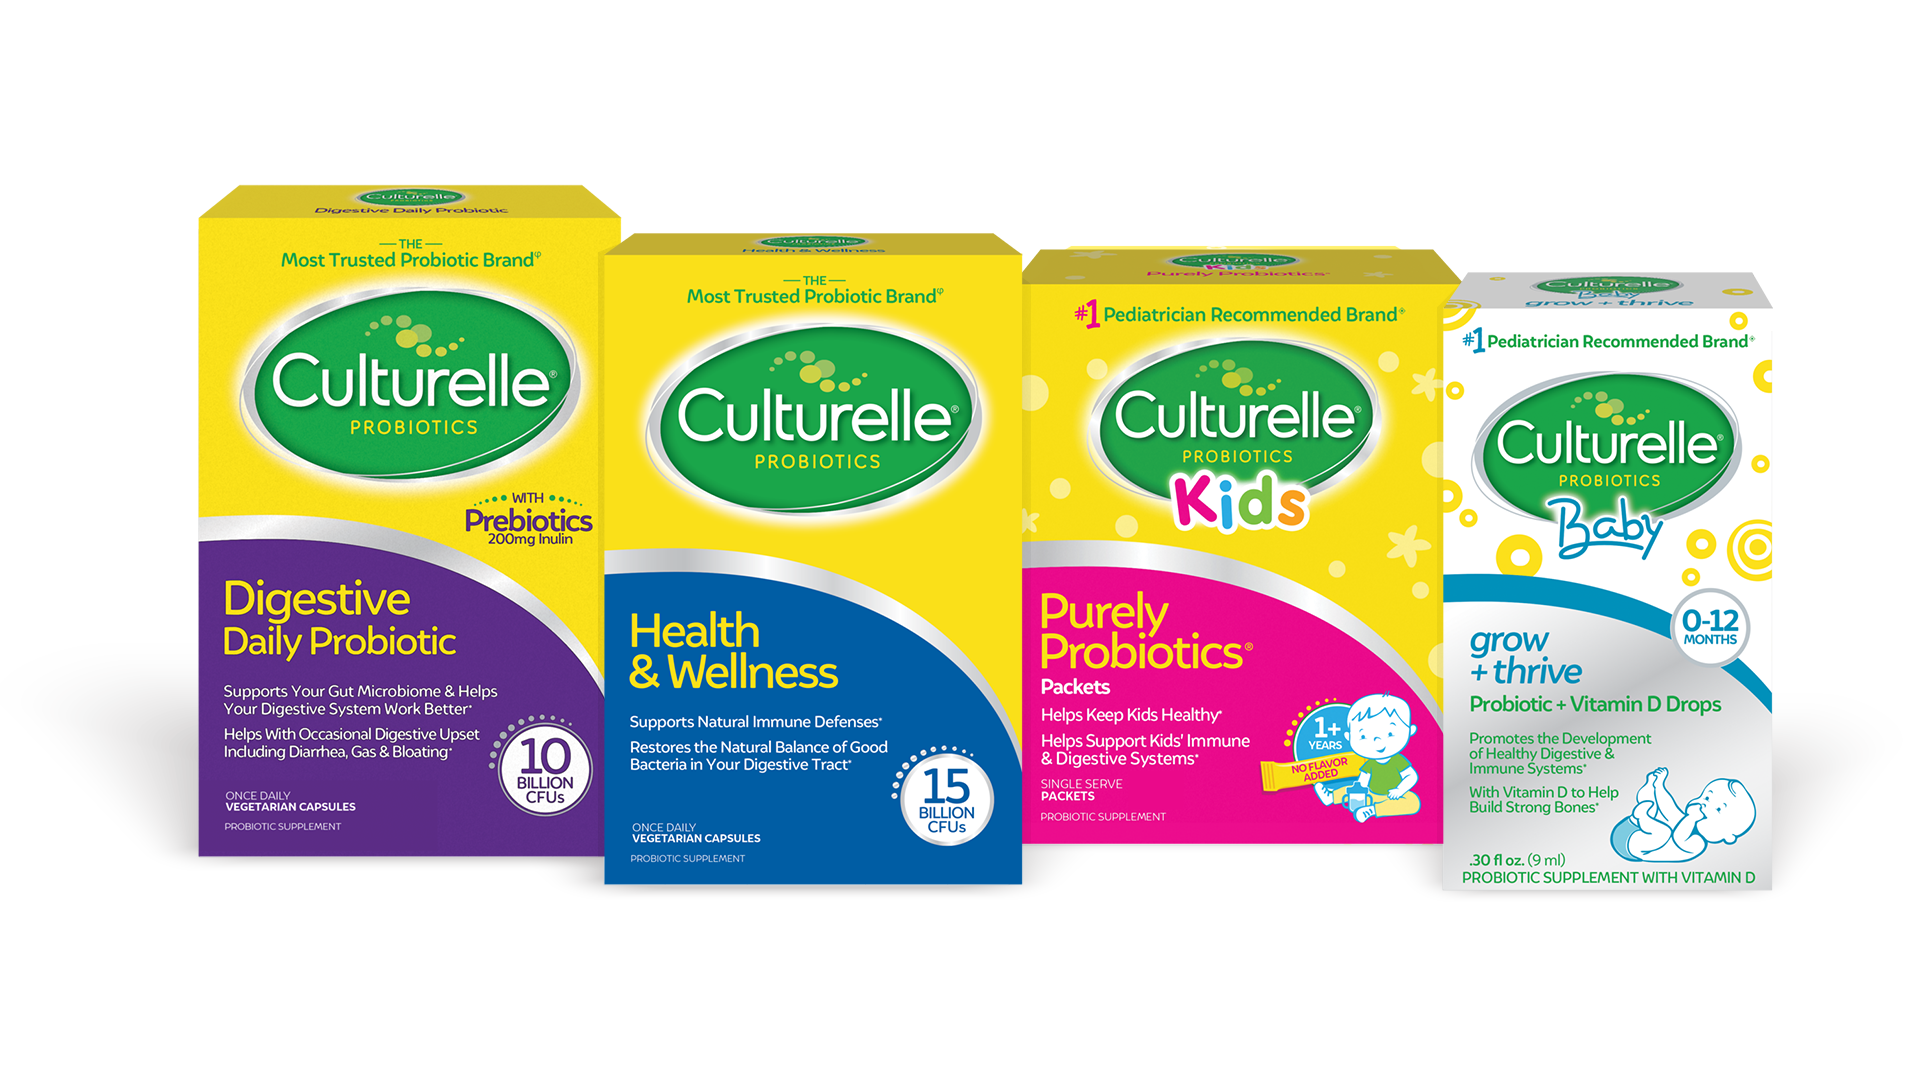 Best Probiotics To Buy Coupons For Culturelle Probiotics